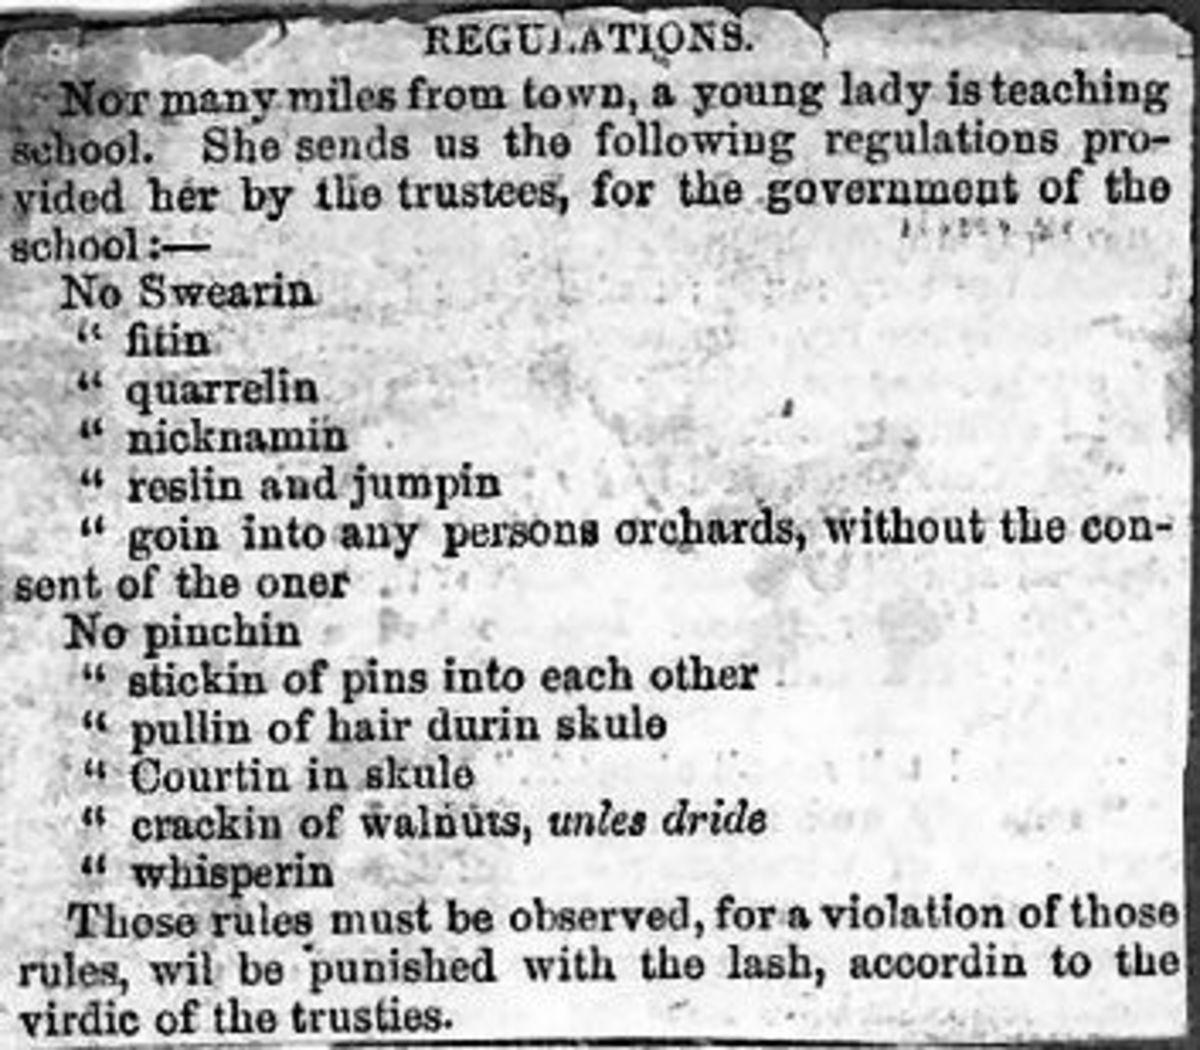 Early 19th century American School Regulations